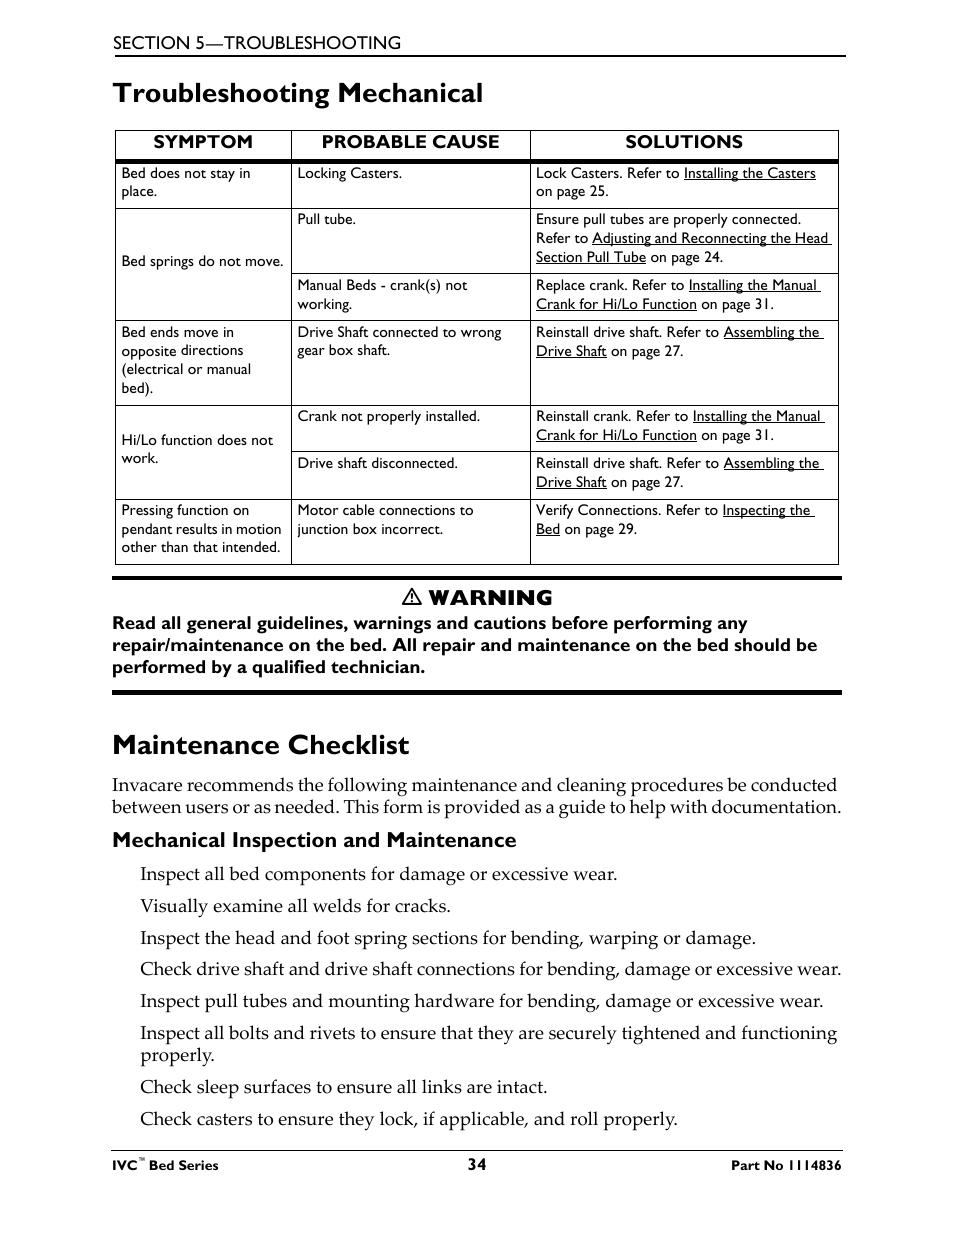 Troubleshooting mechanical maintenance checklist, Troubleshooting mechanical,  Maintenance checklist | Ƽ warning, Mechanical inspection